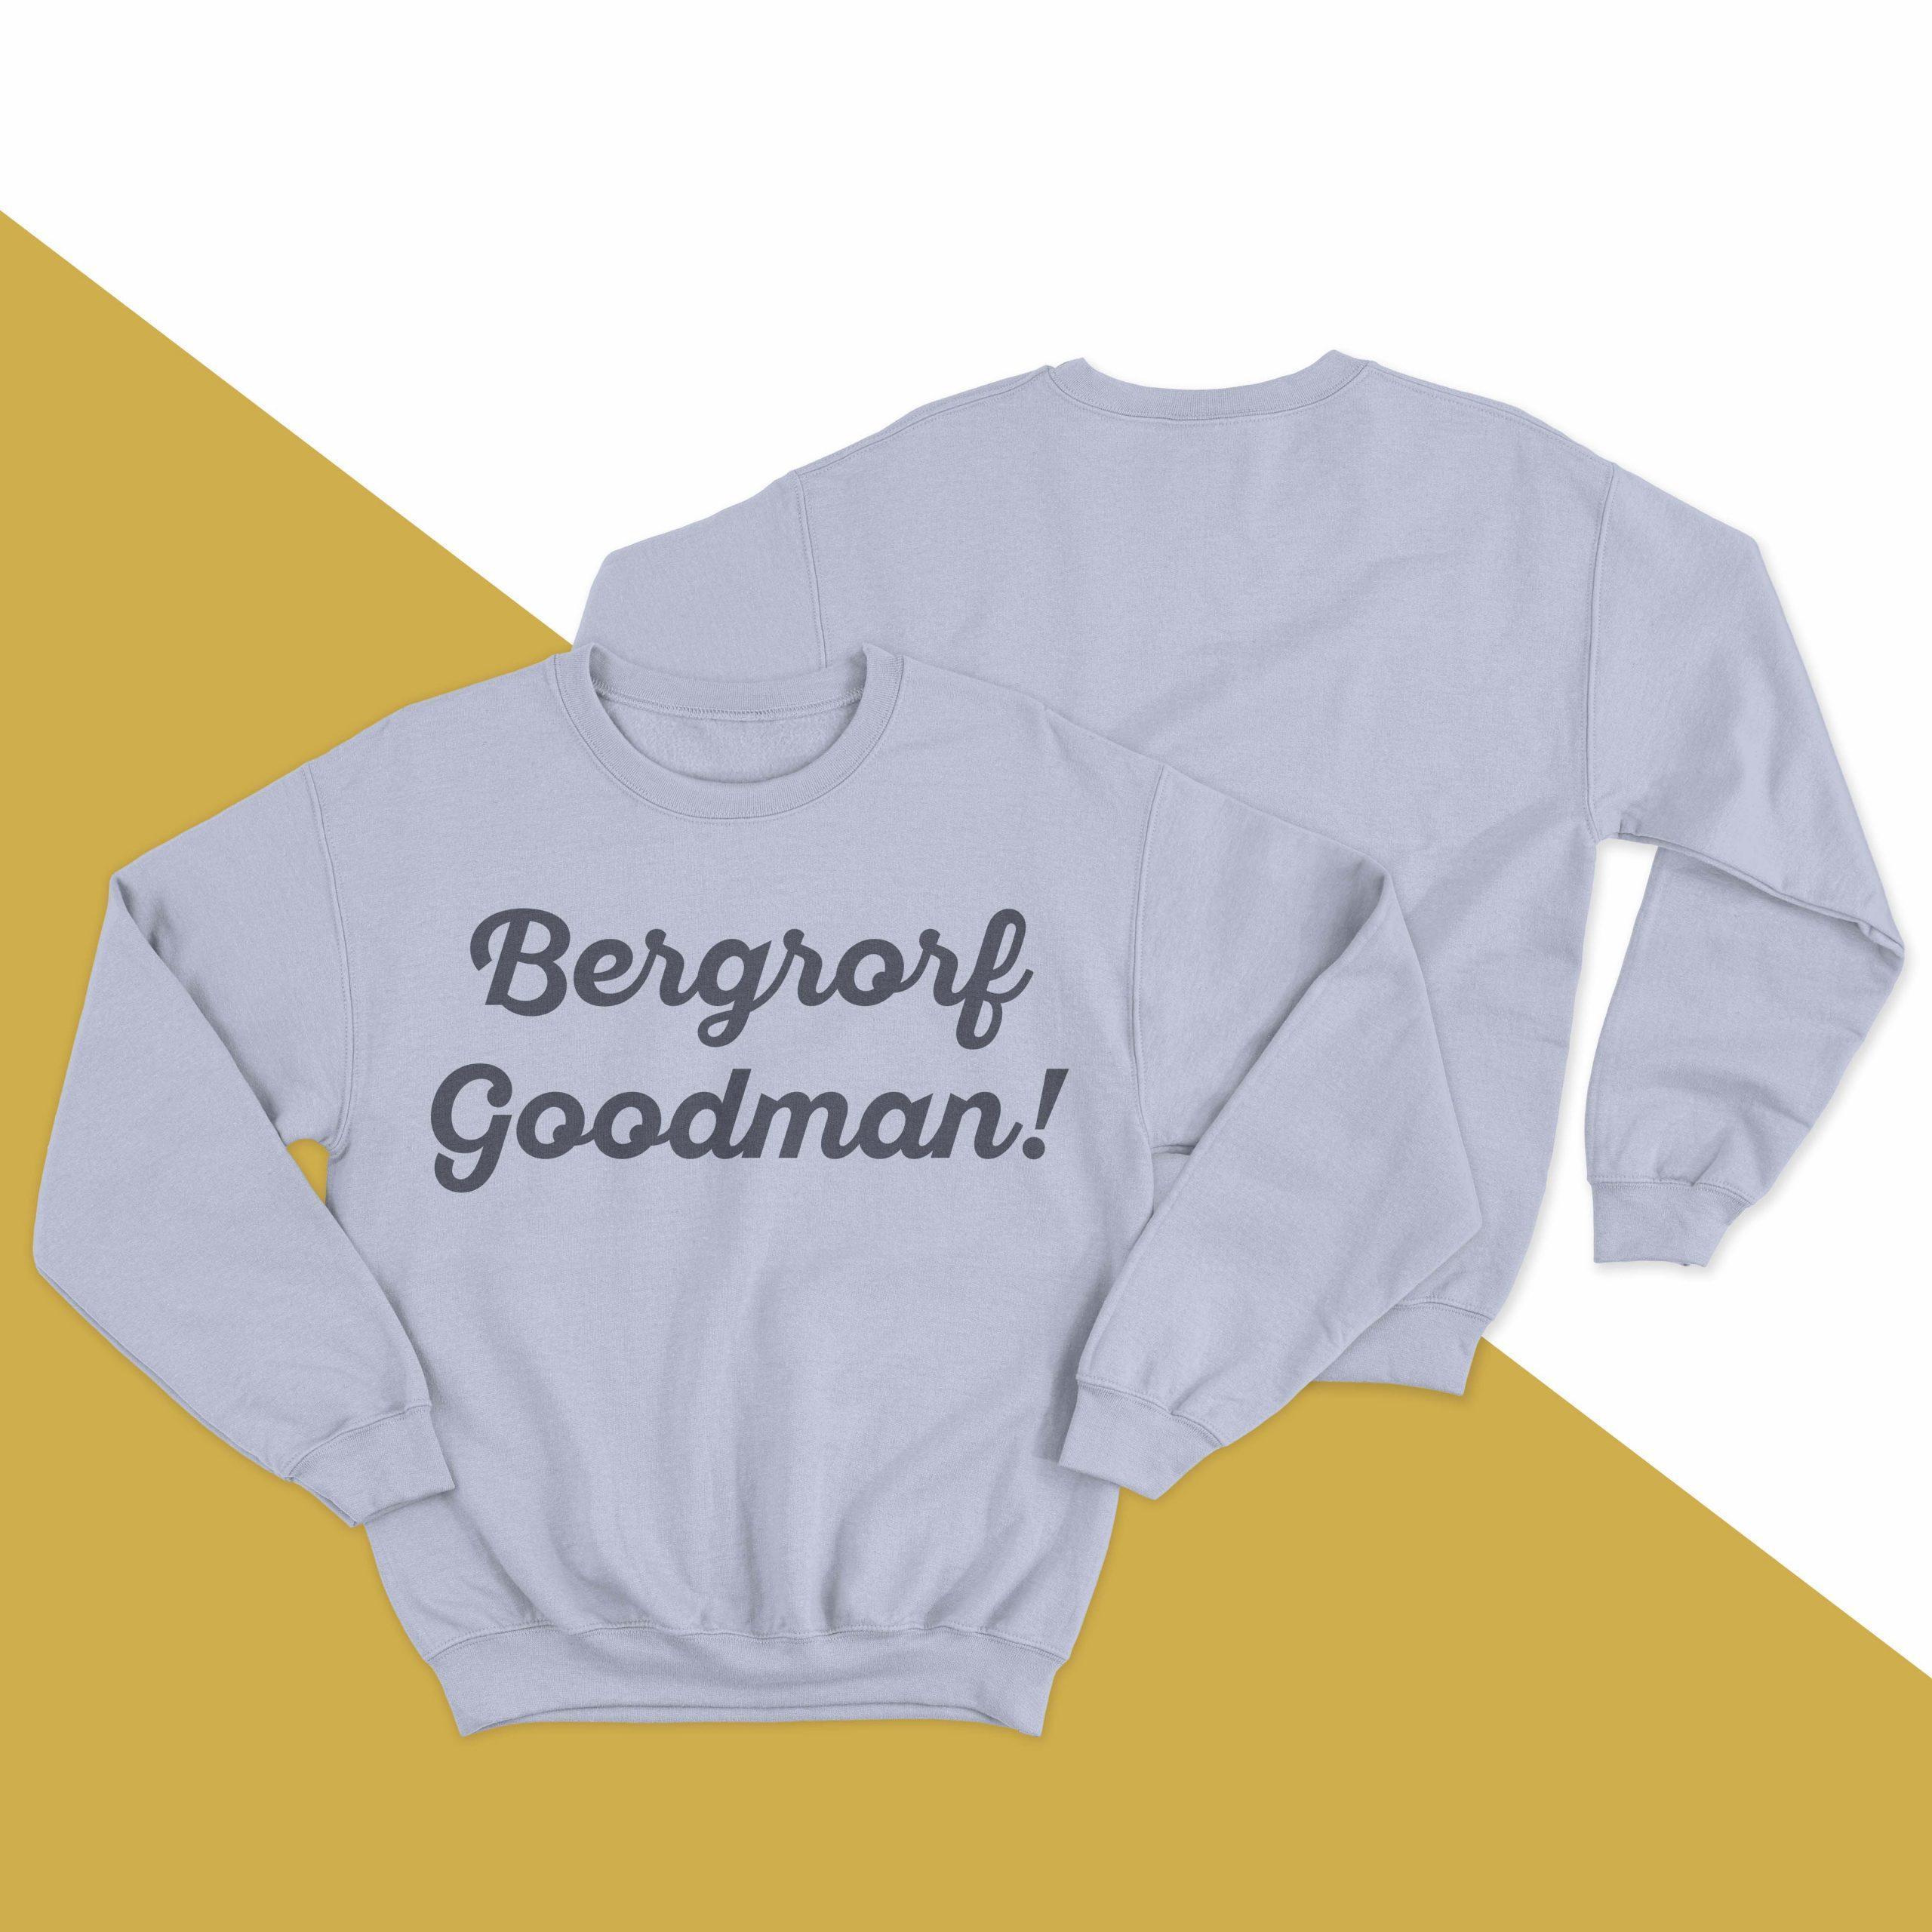 Wendy Williams Bergdorf Goodman T Sweater